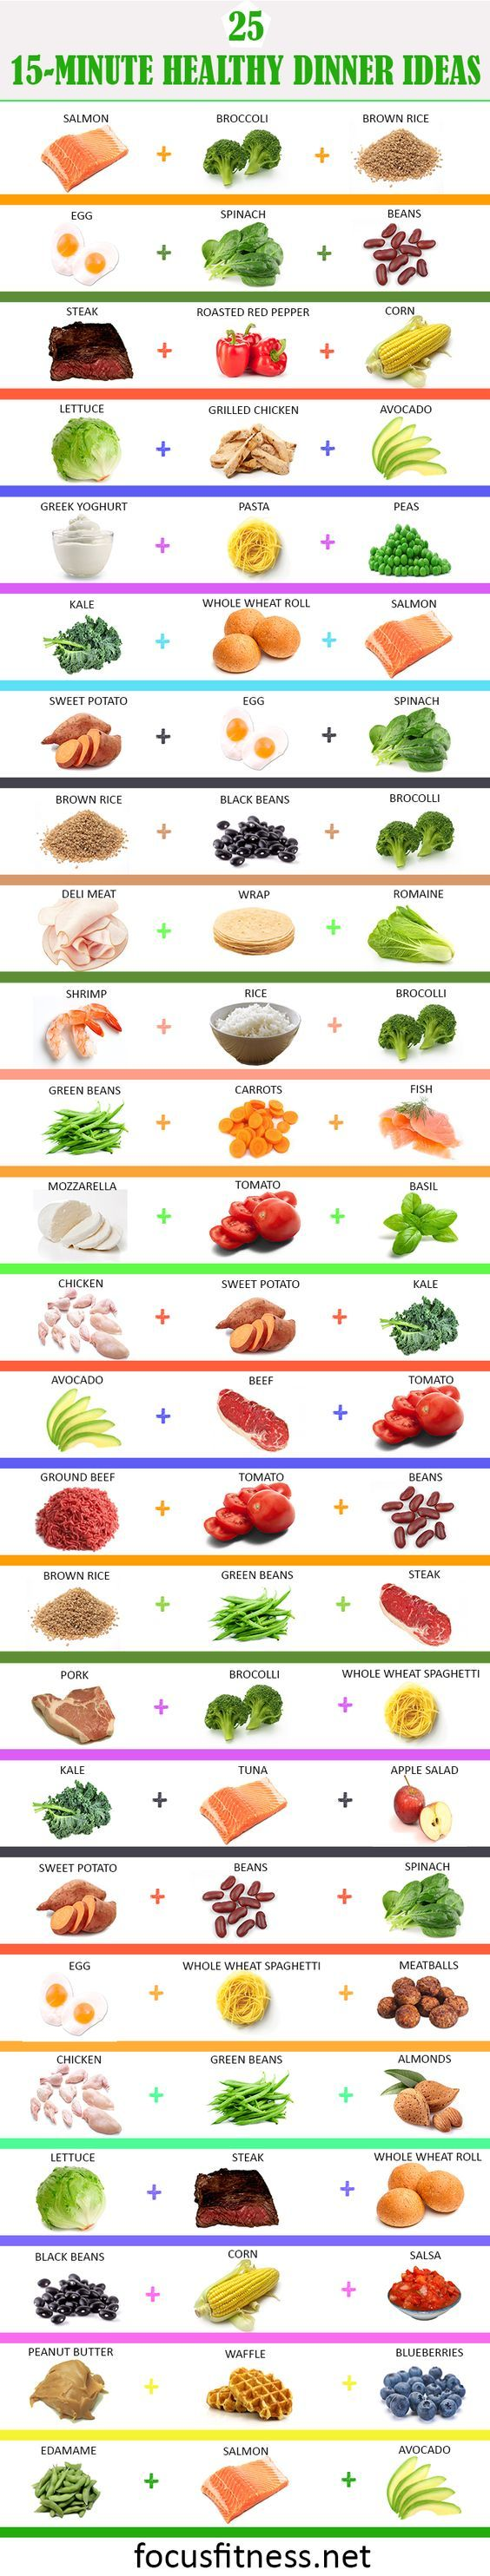 healthy dinner ideas http://focusfitness.net/25-15-minute-healthy-dinner-ideas-for-weight-loss/